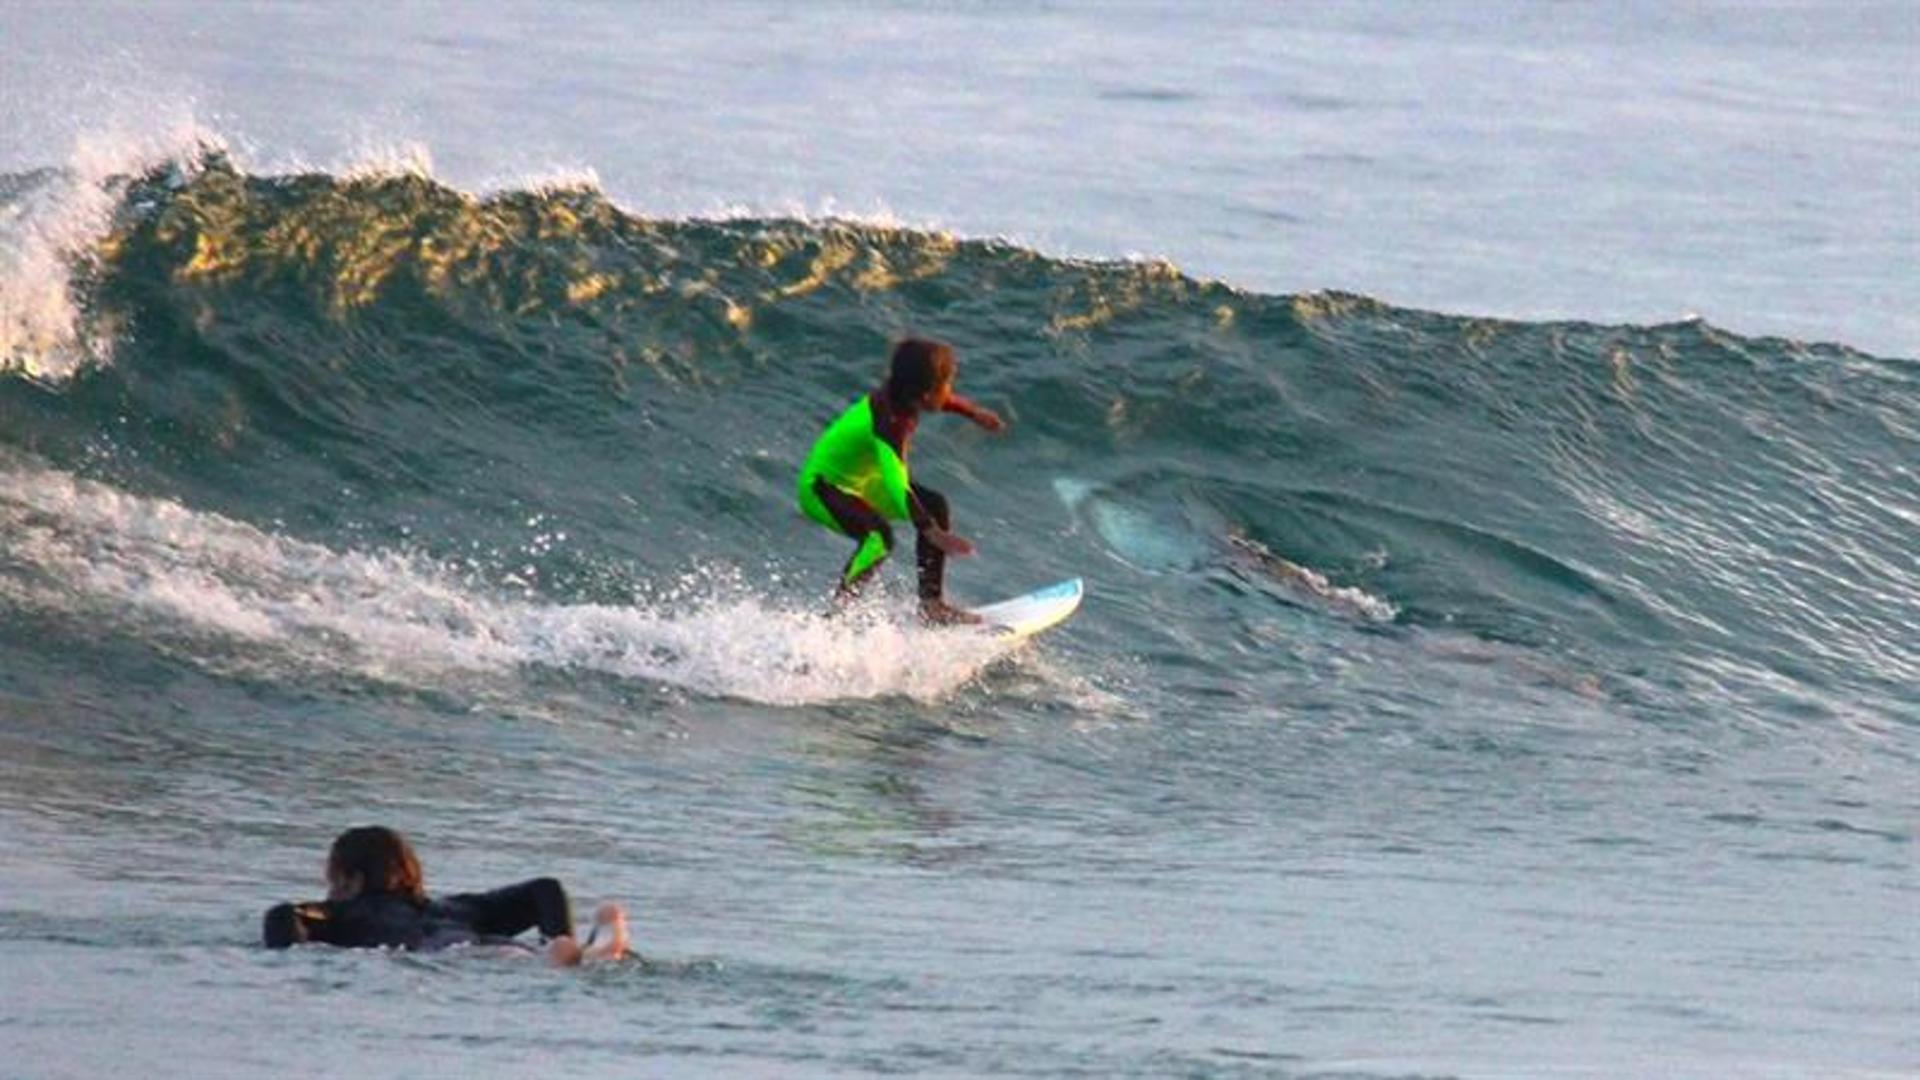 Shark Photobombs Unfazed 10-Year-Old Surfer